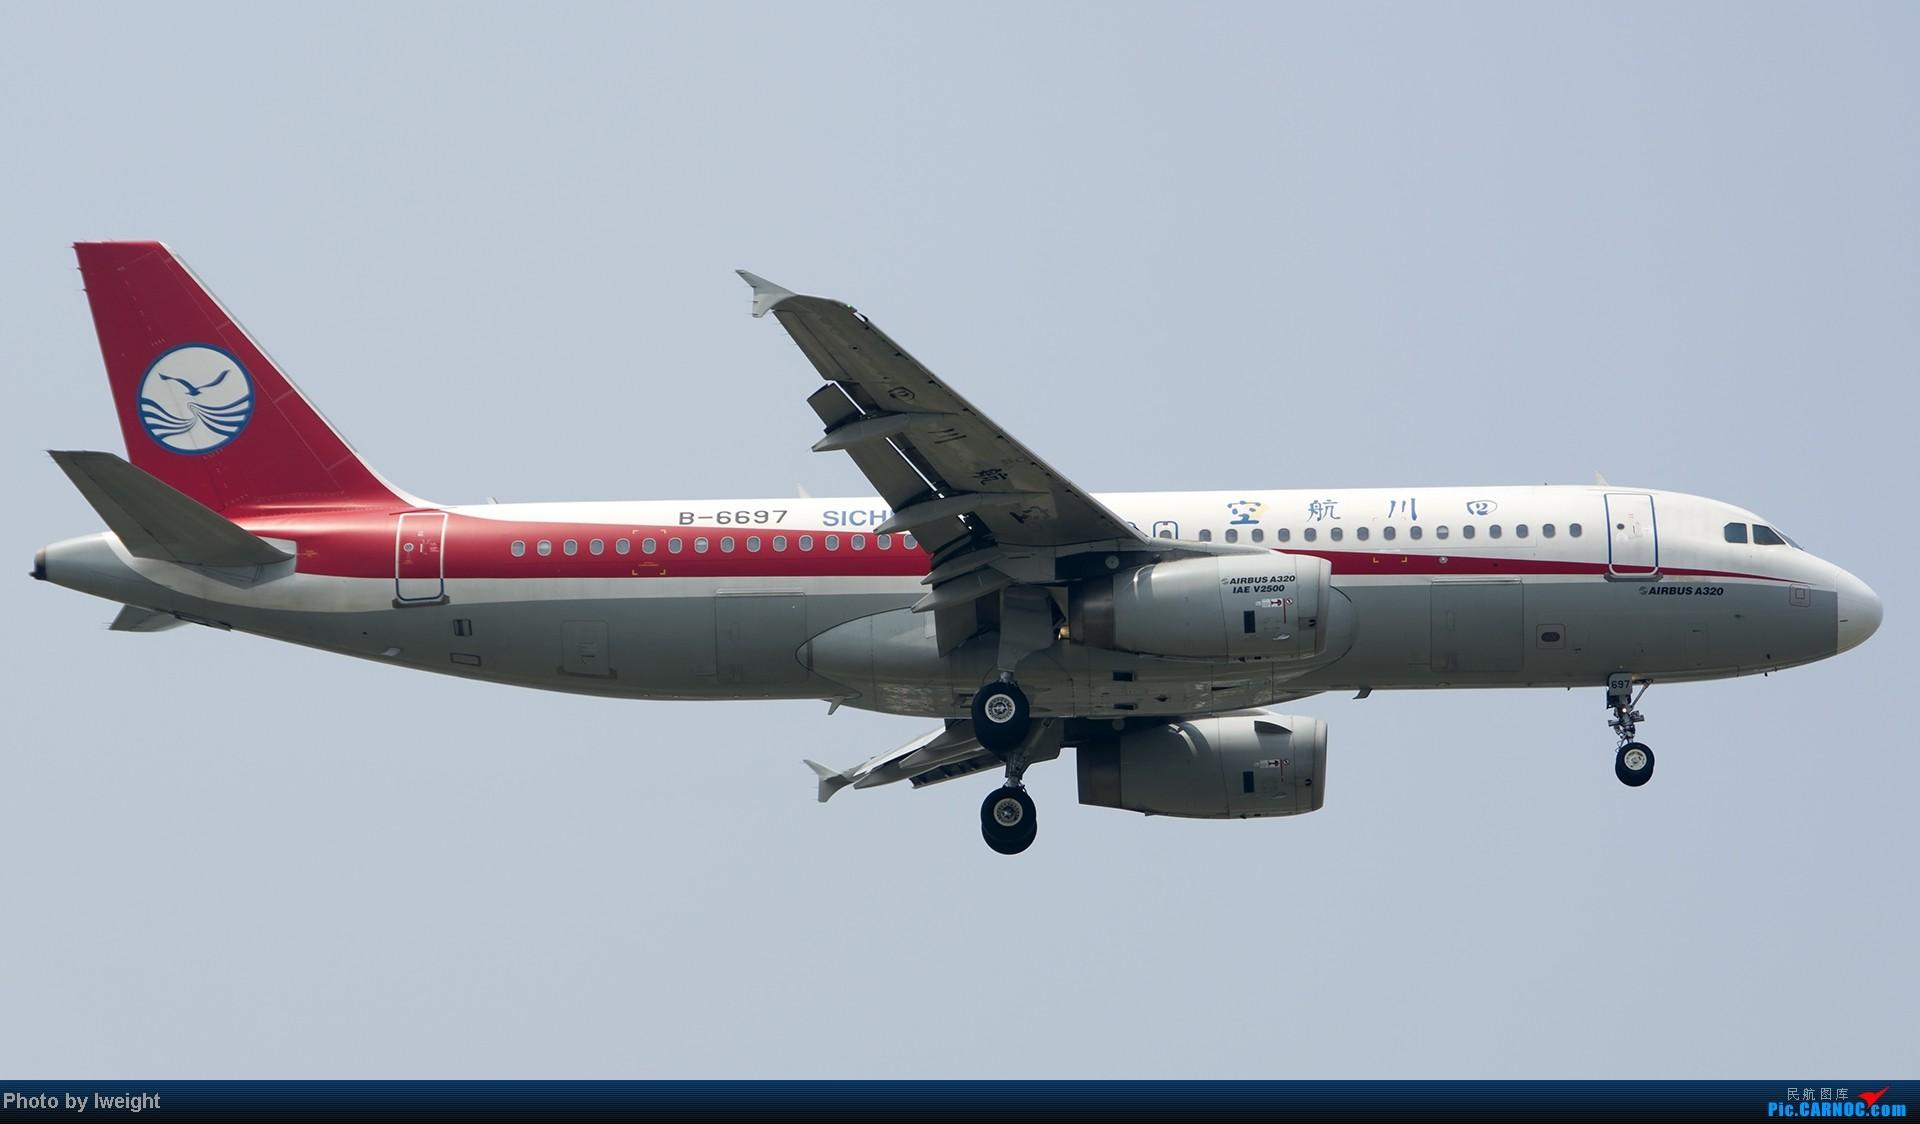 Re:[原创]休假无聊,跑道边来拍机玩(晚点的ZestAir、换装的B6100和刚交付的B2738等) AIRBUS A320-200 B-6697 中国北京首都机场